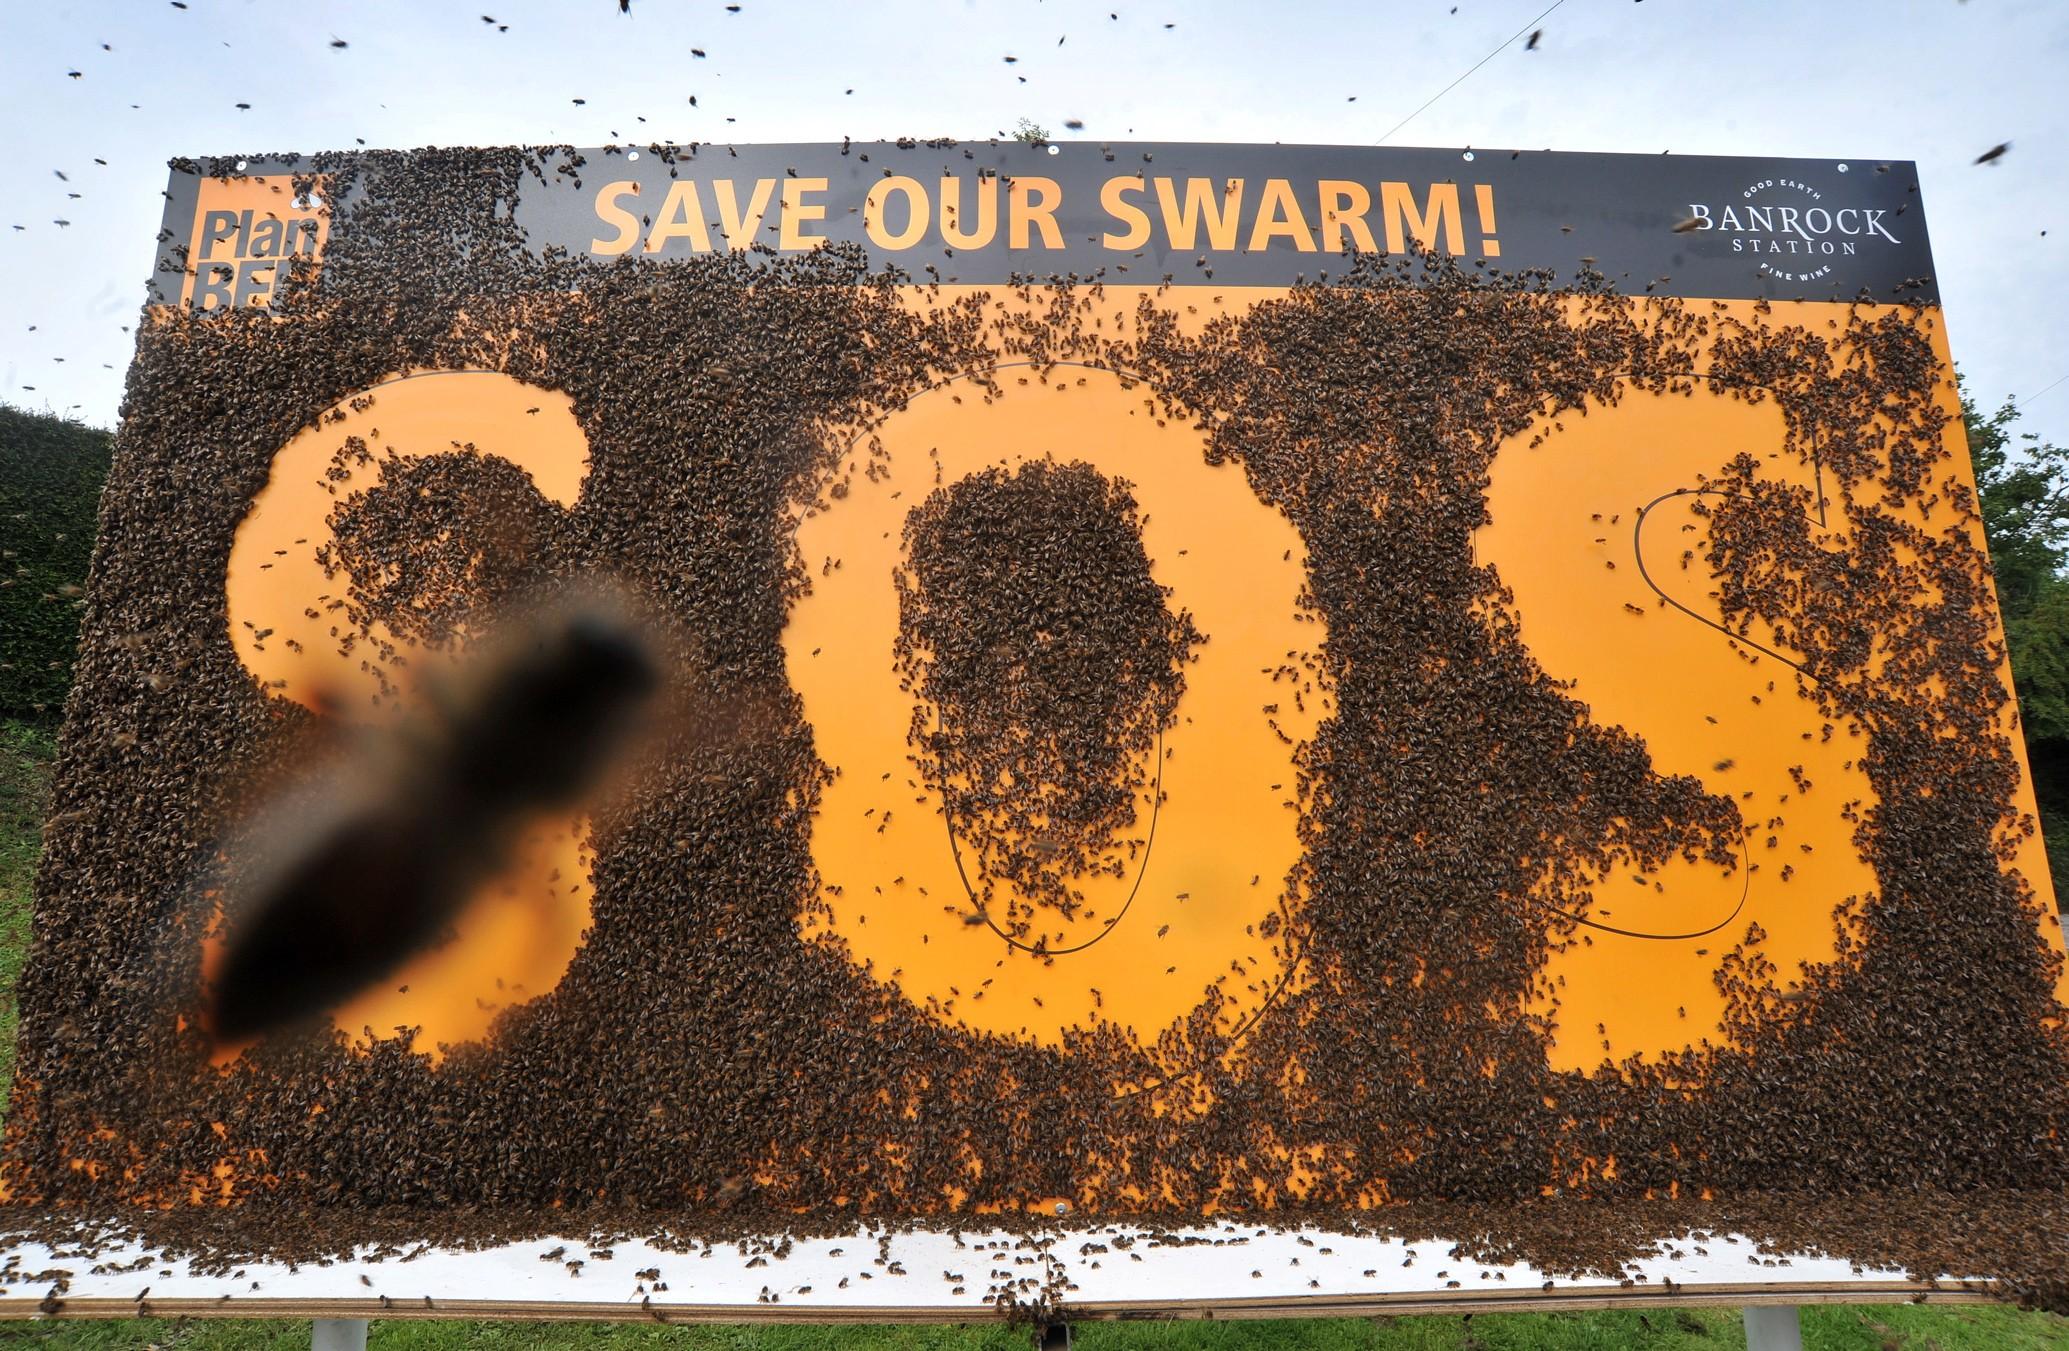 Live bee board billboard outdoor abeilles marketing alternatif banrock station plan bee cooperative 3 Пчелиный рекламный щит